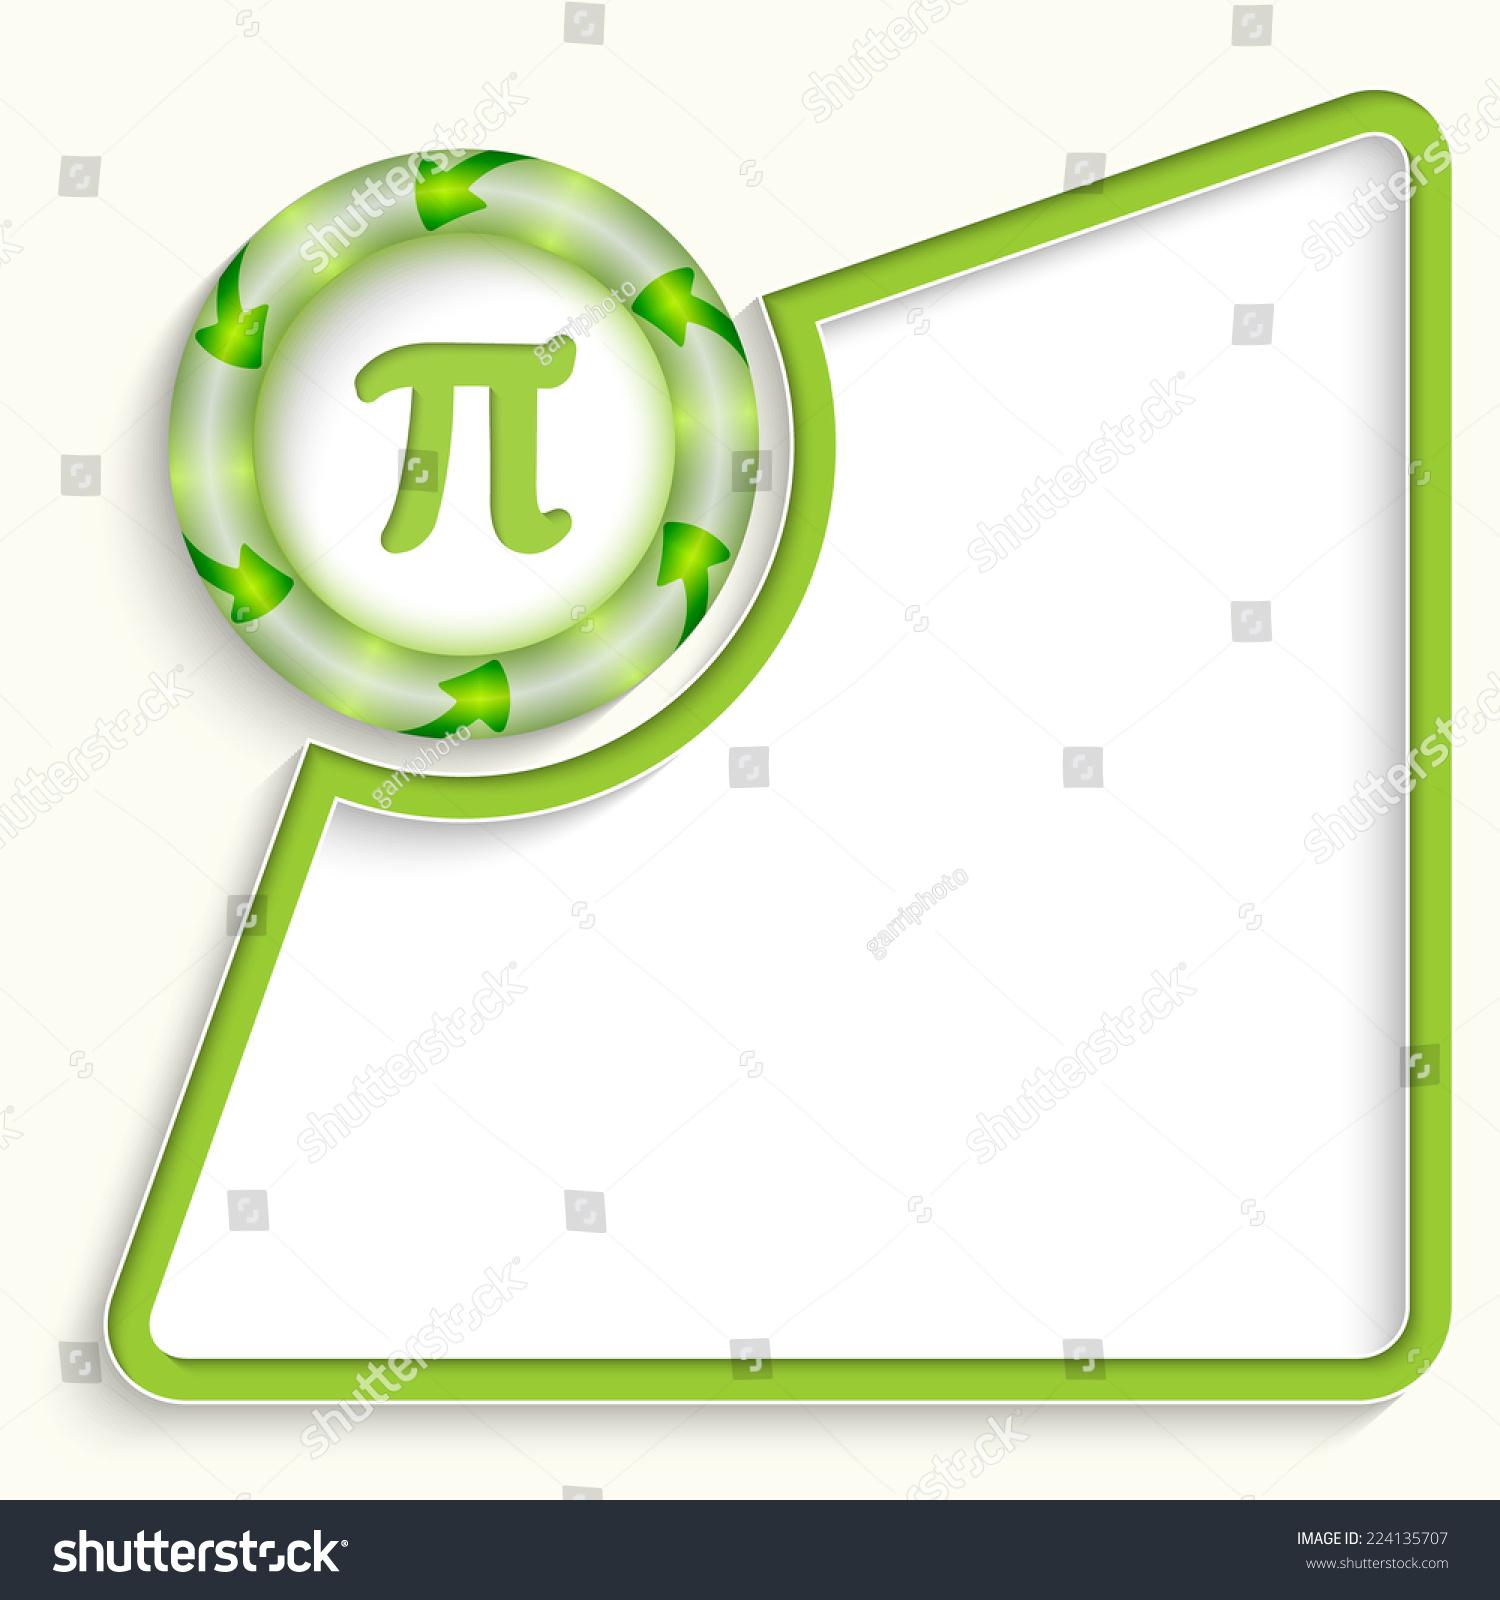 Abstract Frame Any Text Pi Symbol Stock Vector Royalty Free